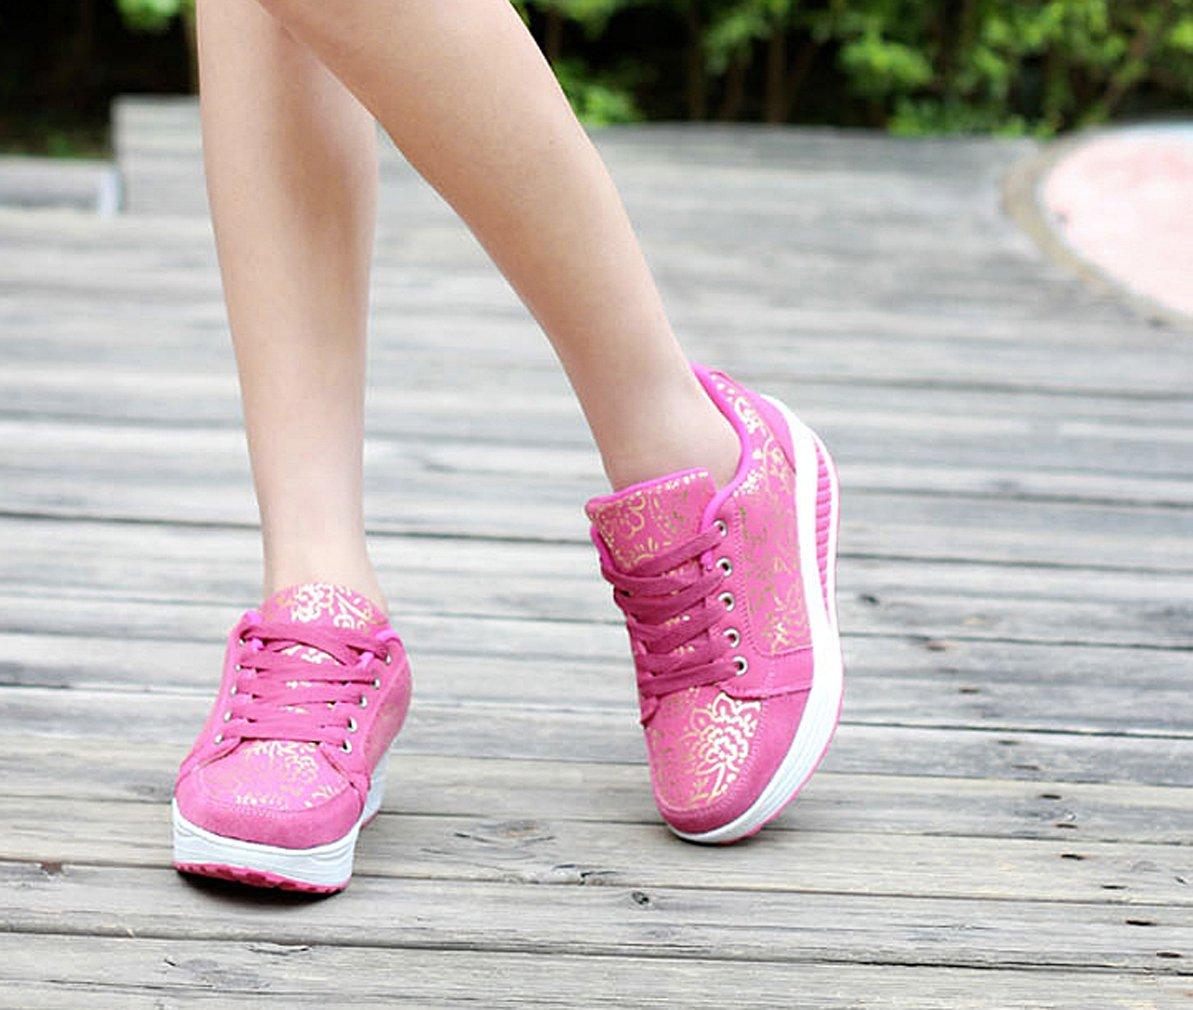 37fa39a8983d ... Solshine Damen Fashion Plateau Schnürer Sneakers mit Pink Keilabsatz  Walkmaxx Schuhe Fitnessschuhe Pink mit 3 665b9d ...